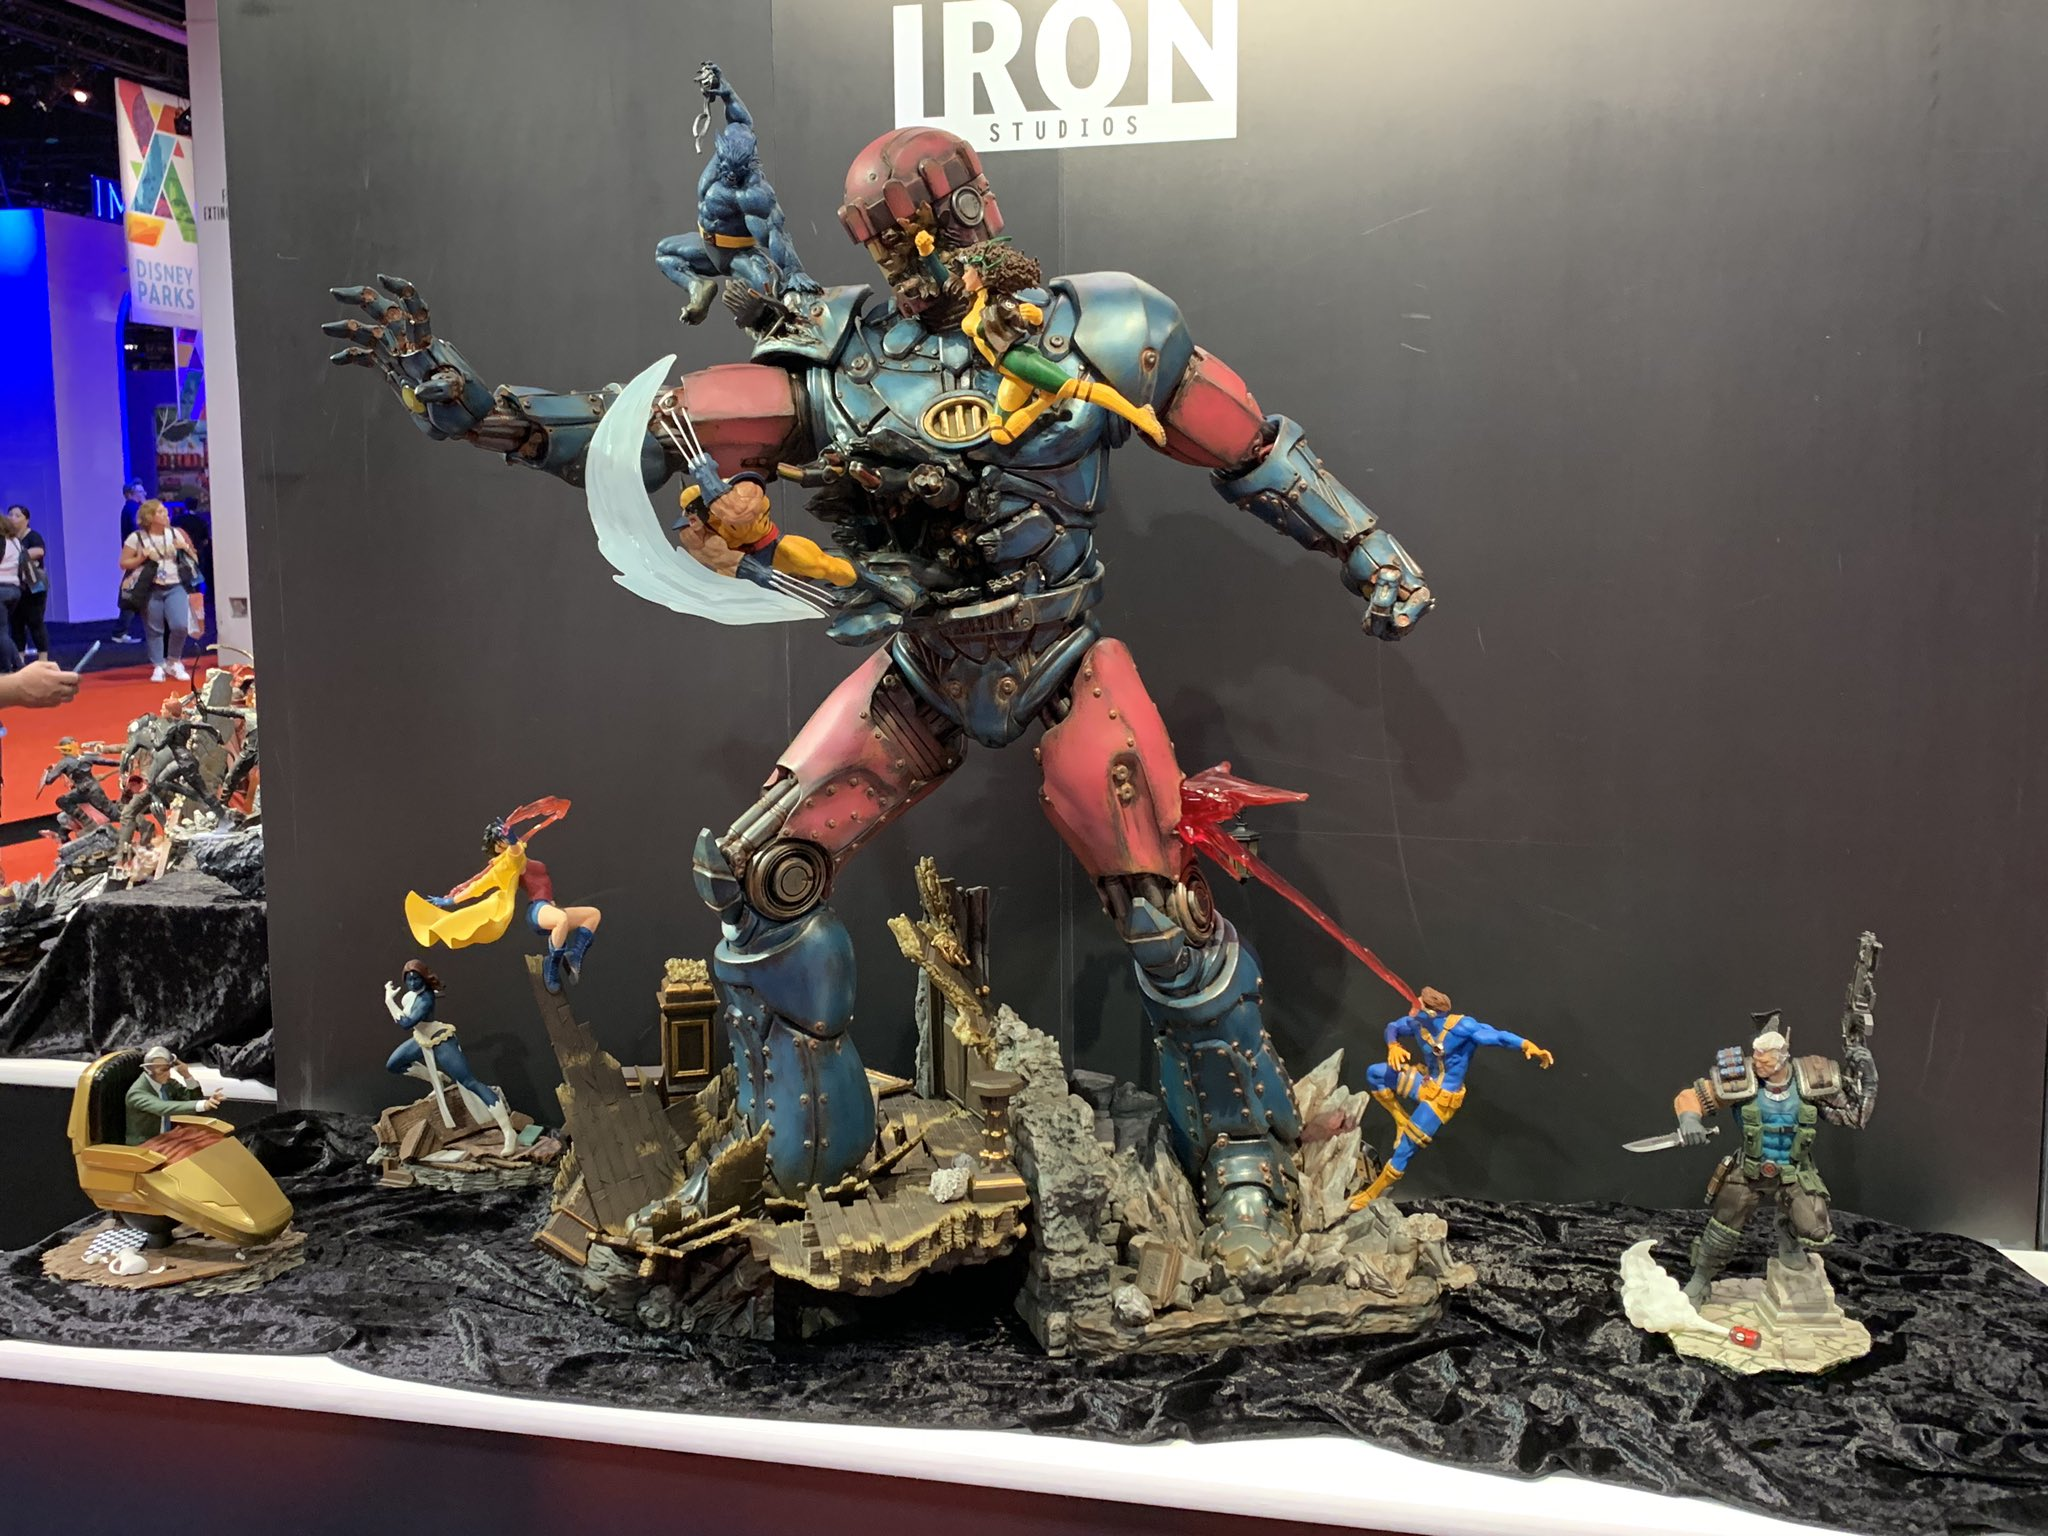 NEW D23 Expo 2019 Iron Studios Marvel X-Men Poster Gold Member Exclusive